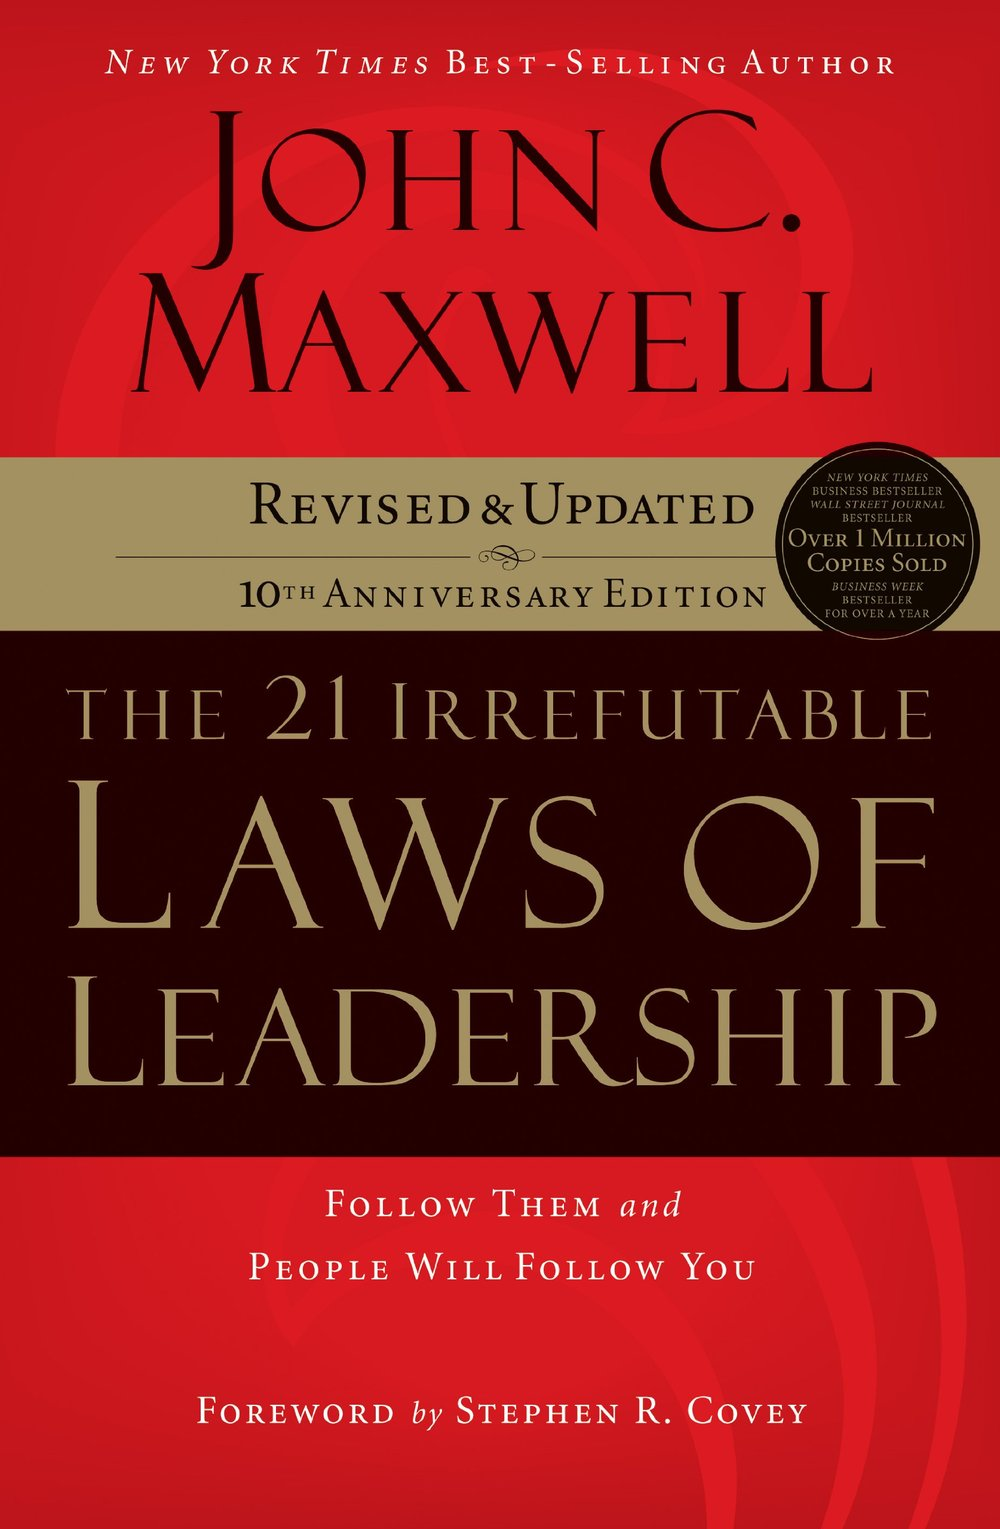 the-21-irrefutable-laws-of-leadership.jpg